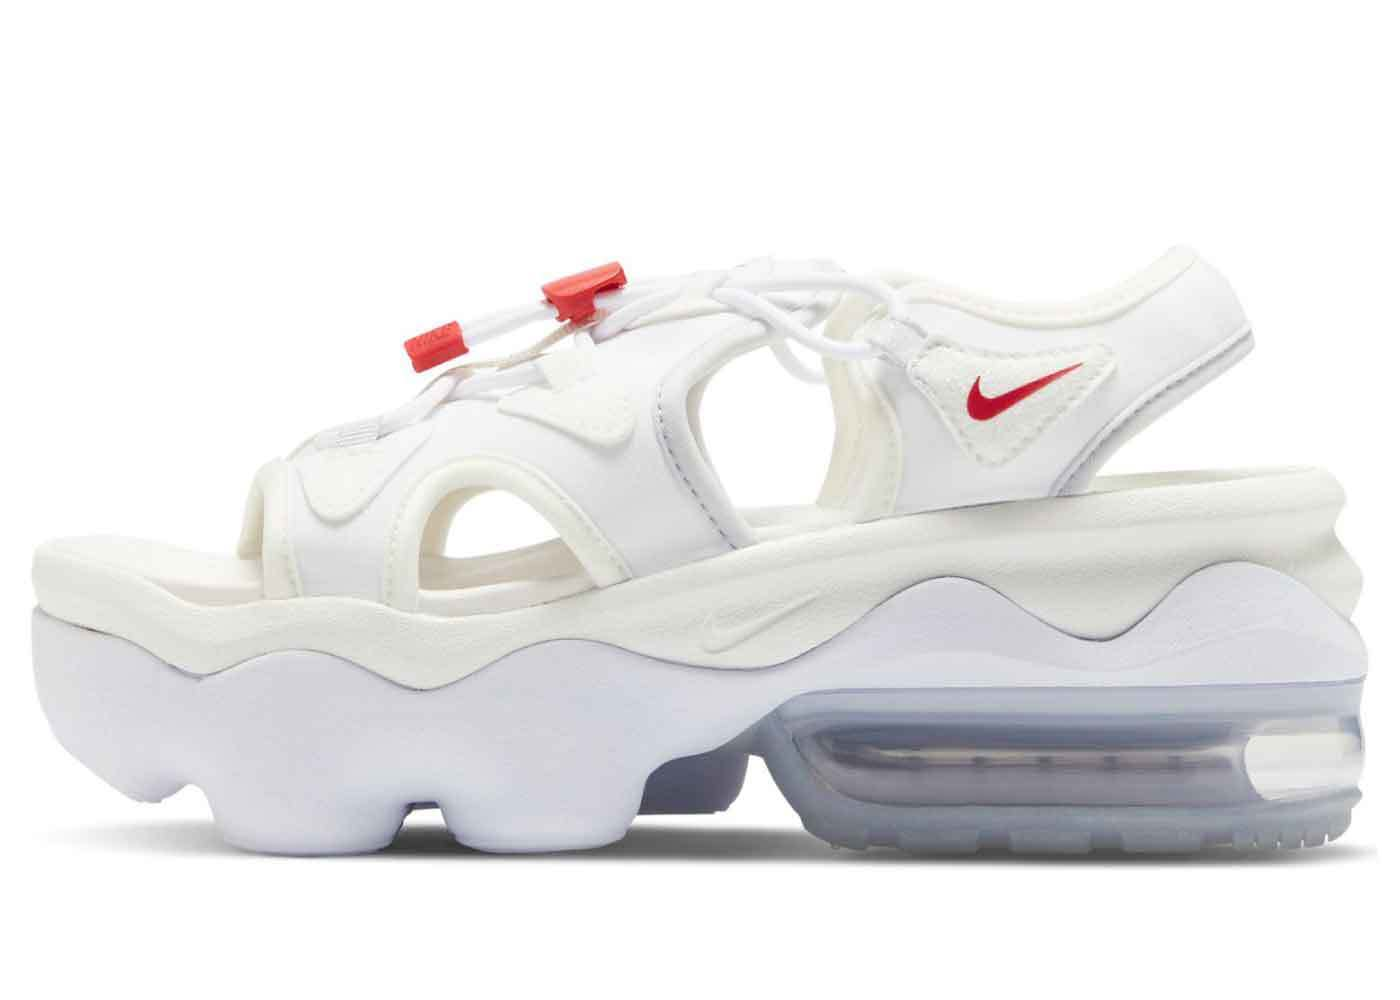 Nike Air Max Koko Sandal White University Red Womensの写真